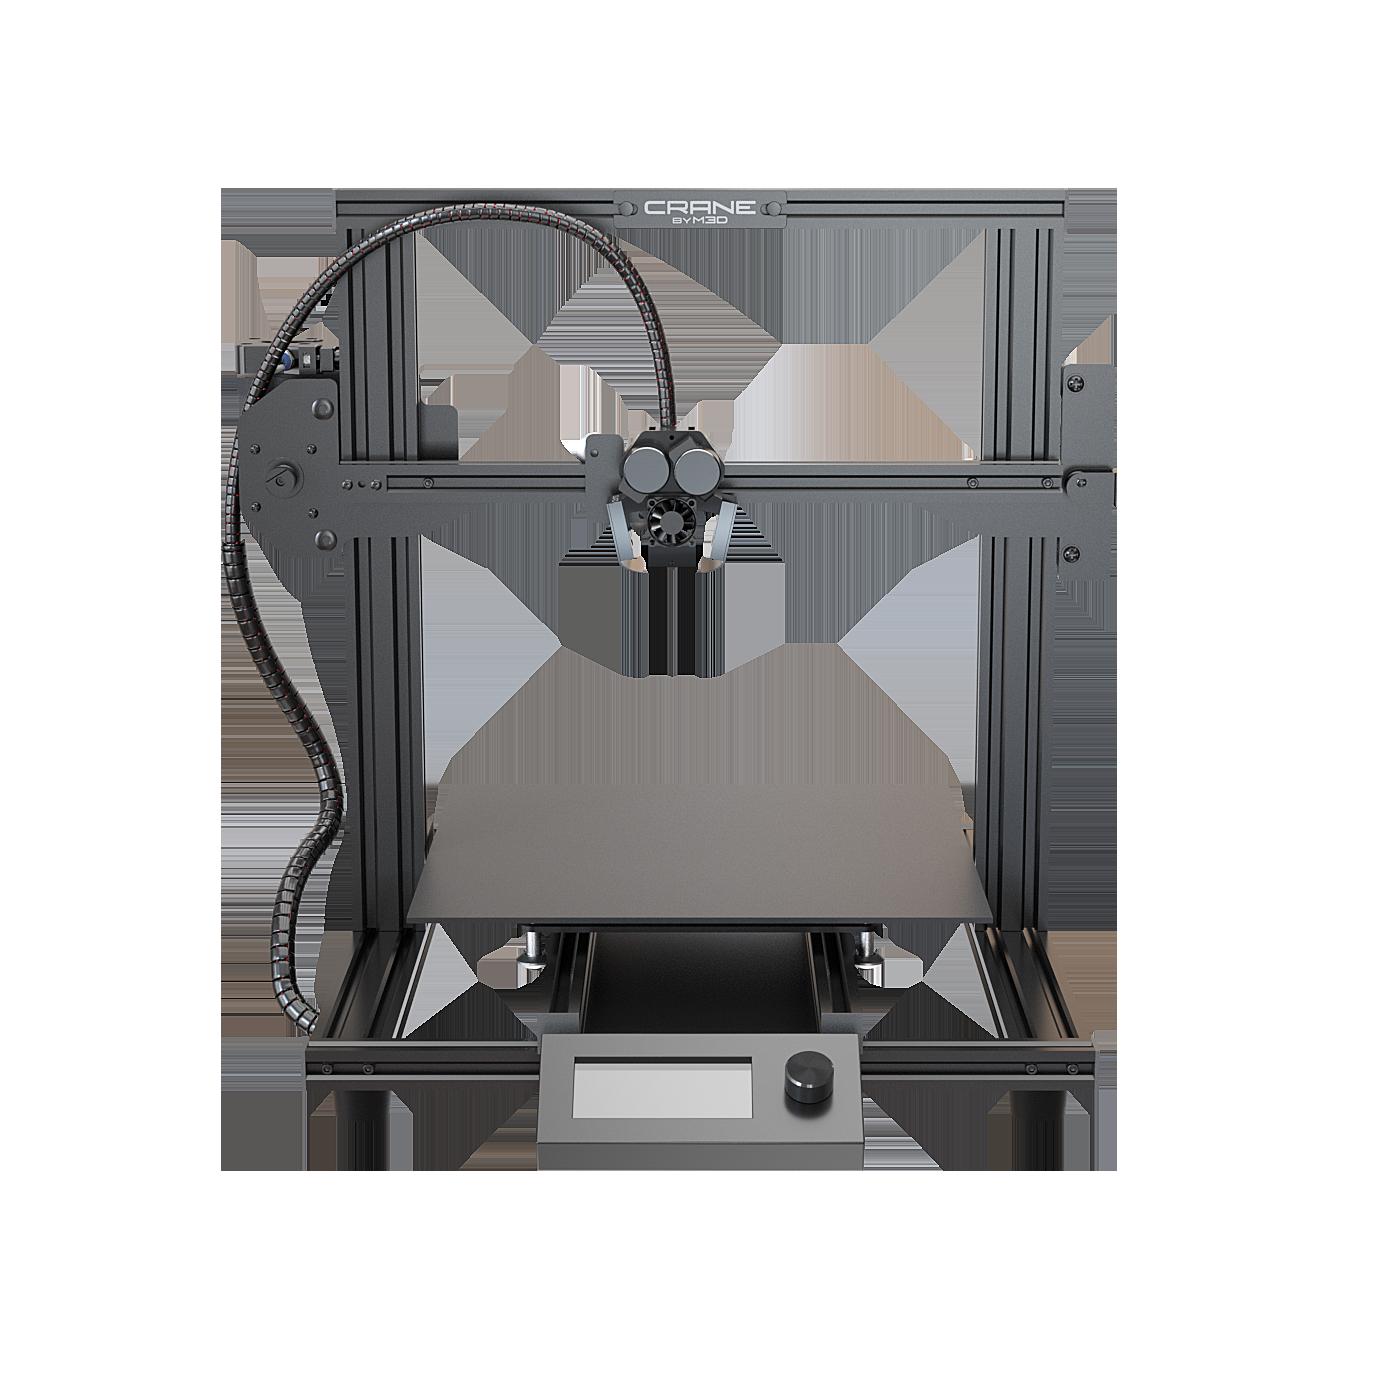 M3D Launches Crane Quad 3D Printer, The World's First Full